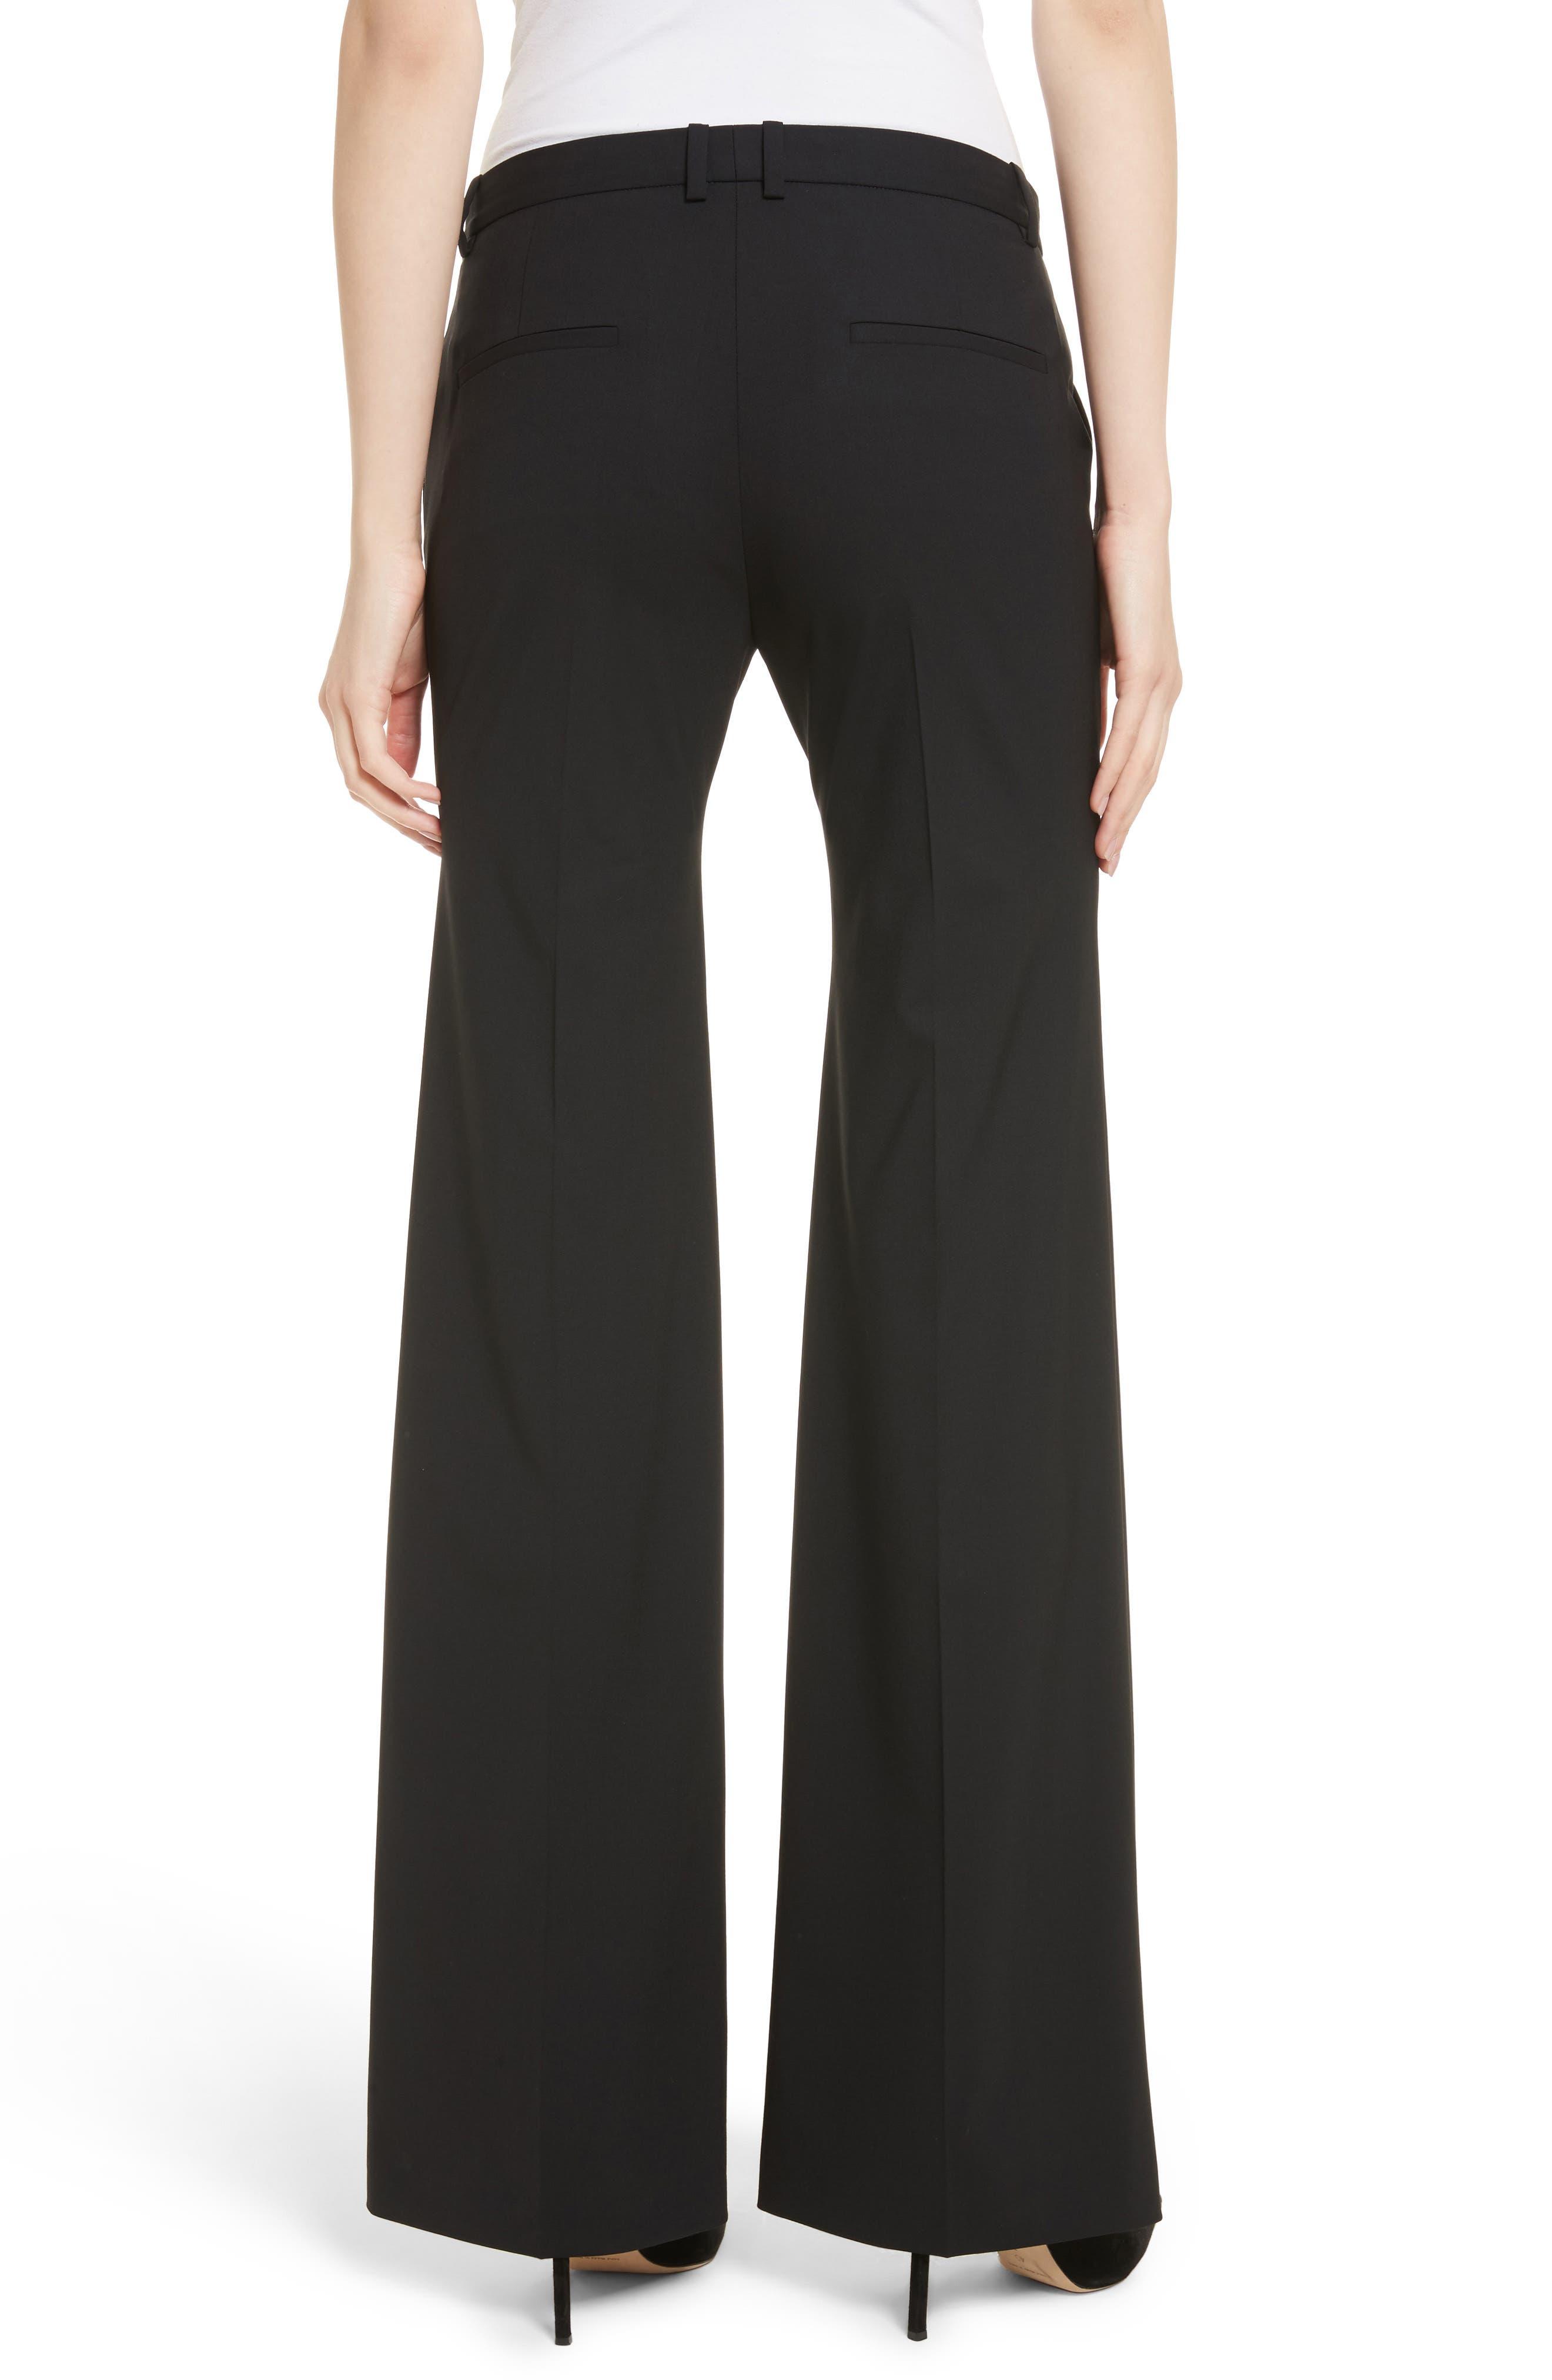 Demetria 2 Flare Leg Good Wool Suit Pants,                             Alternate thumbnail 2, color,                             BLACK